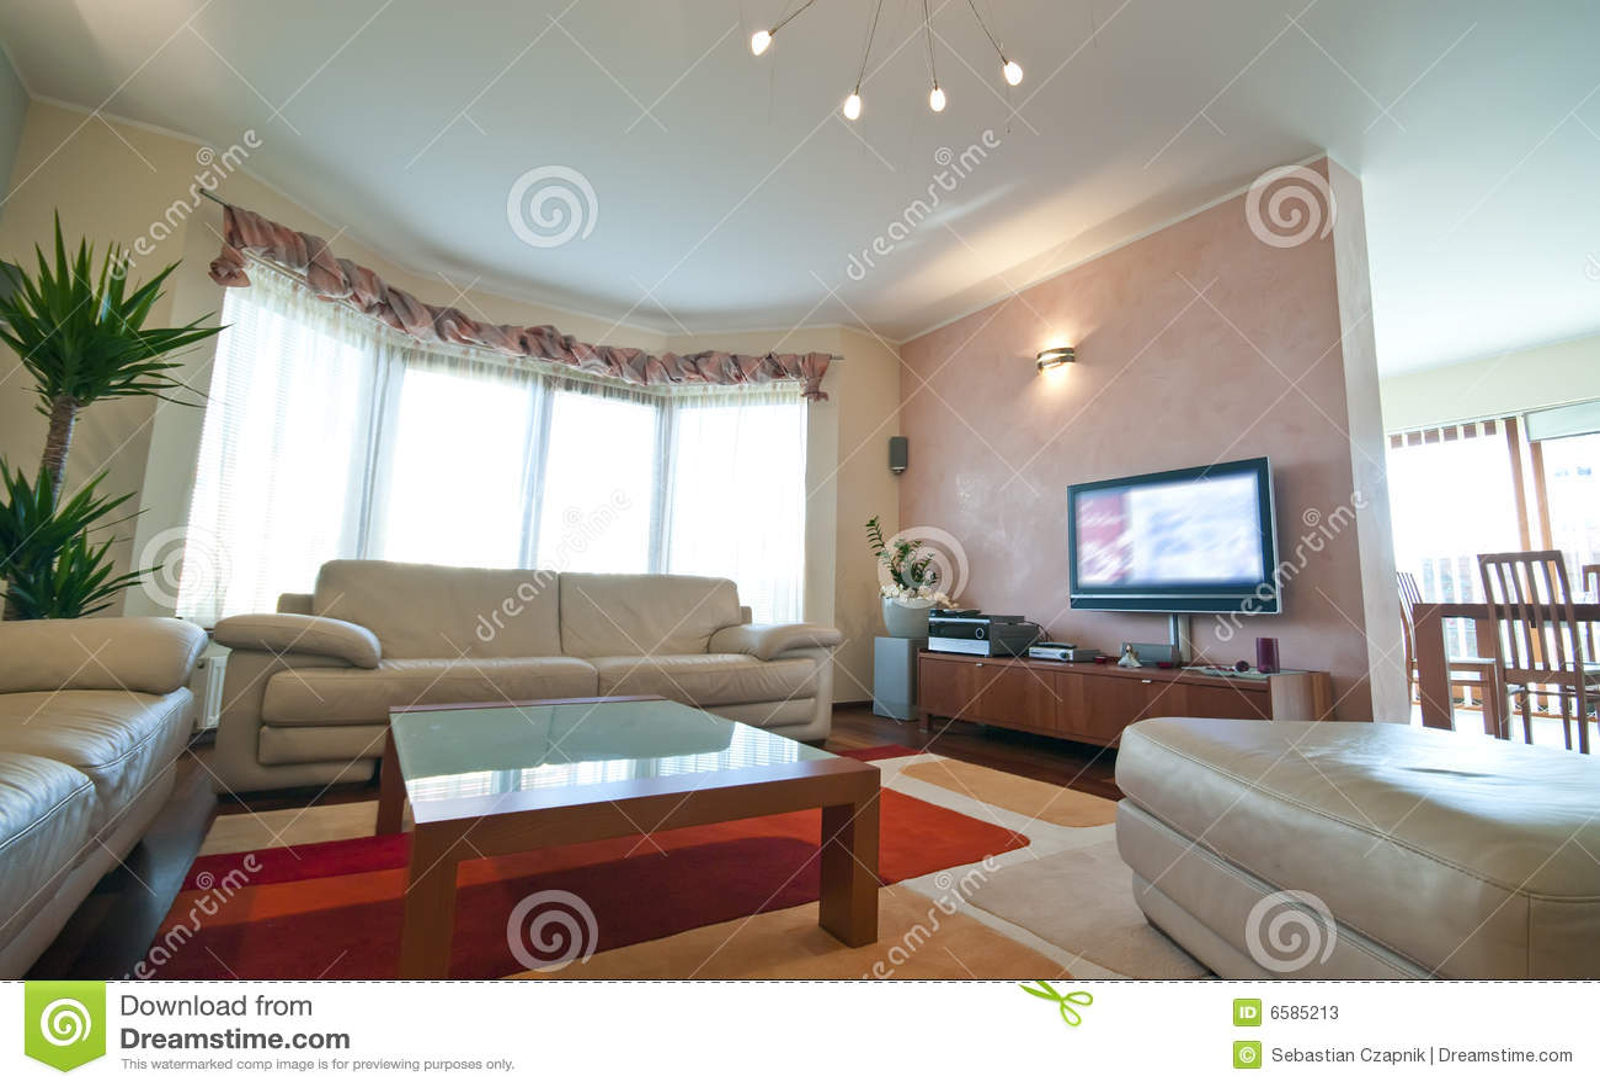 Sala de estar lujosa imagen de archivo imagen de for Salas para casas chiquitas